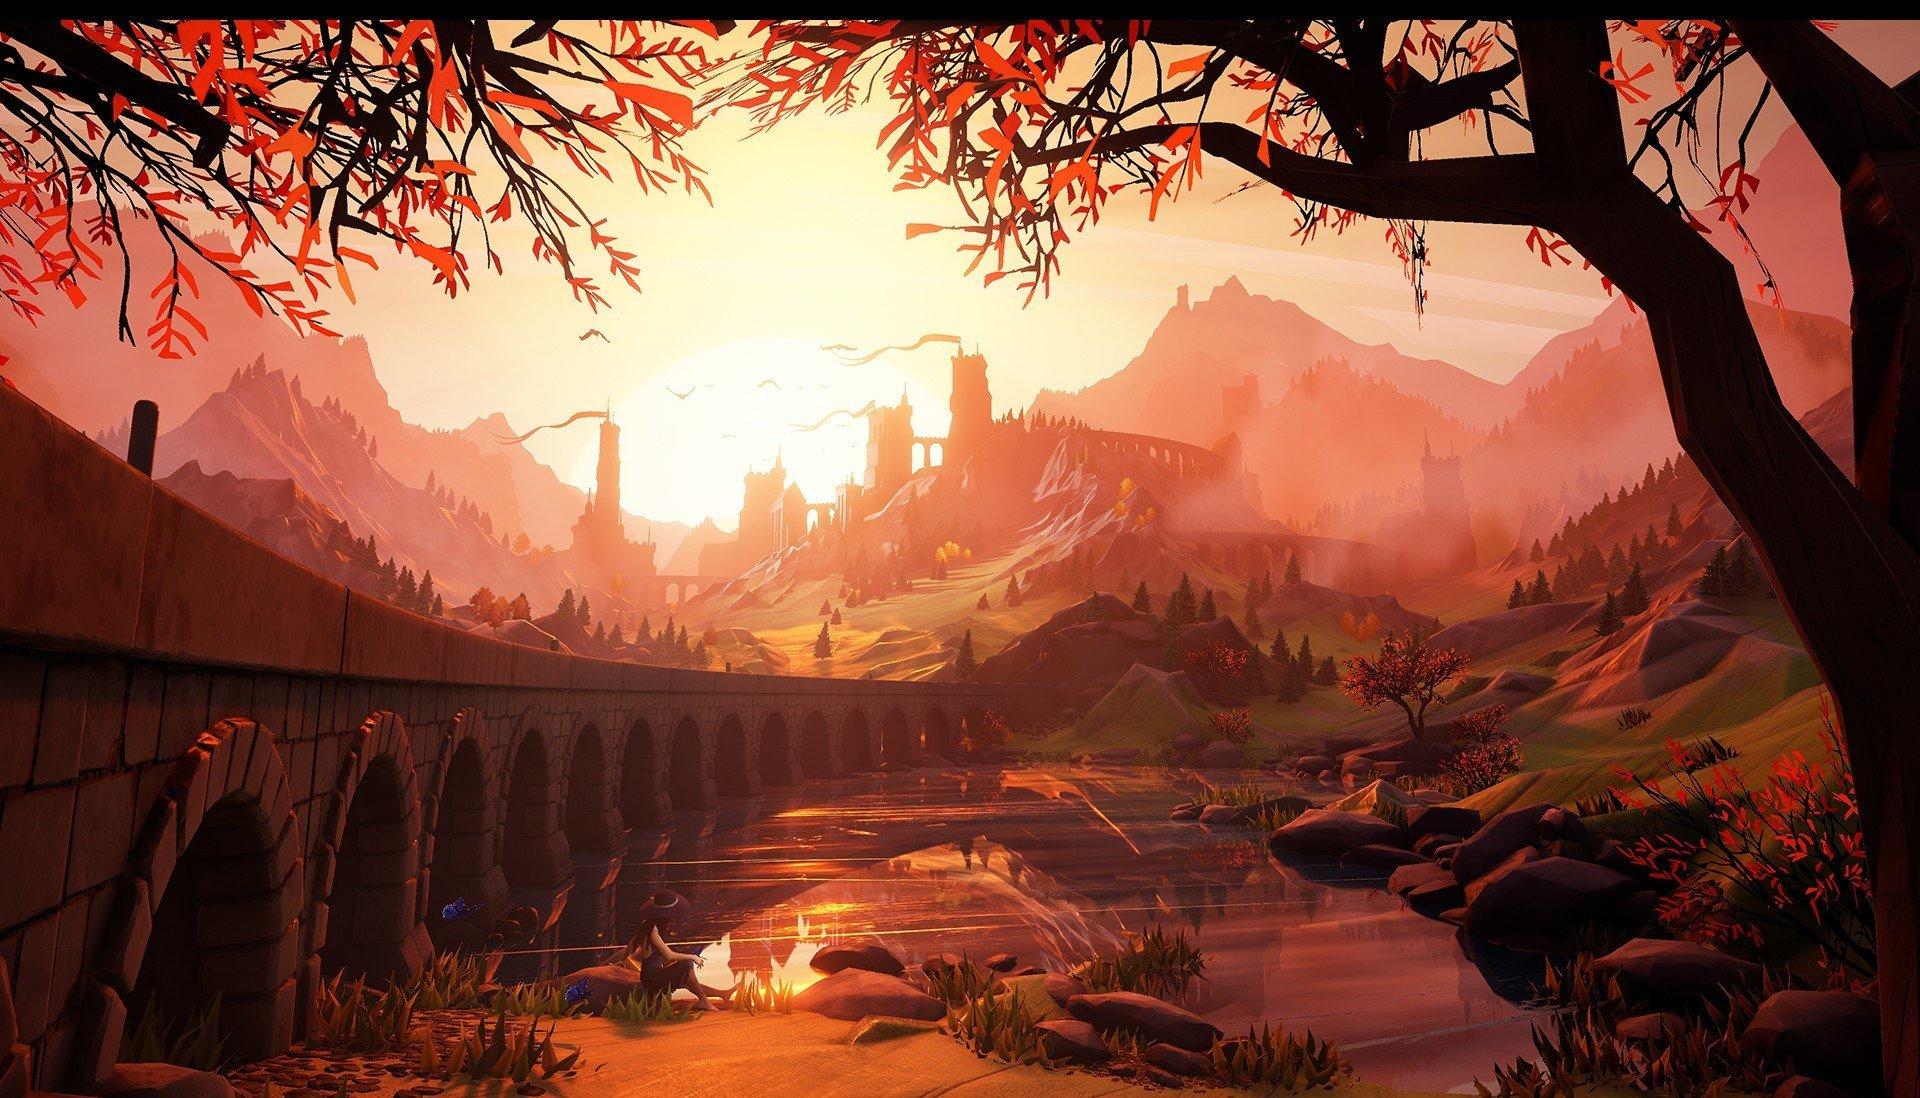 5760x1080 Anime Wallpaper Illustration Sunset Castle Artwork Hd Wallpapers